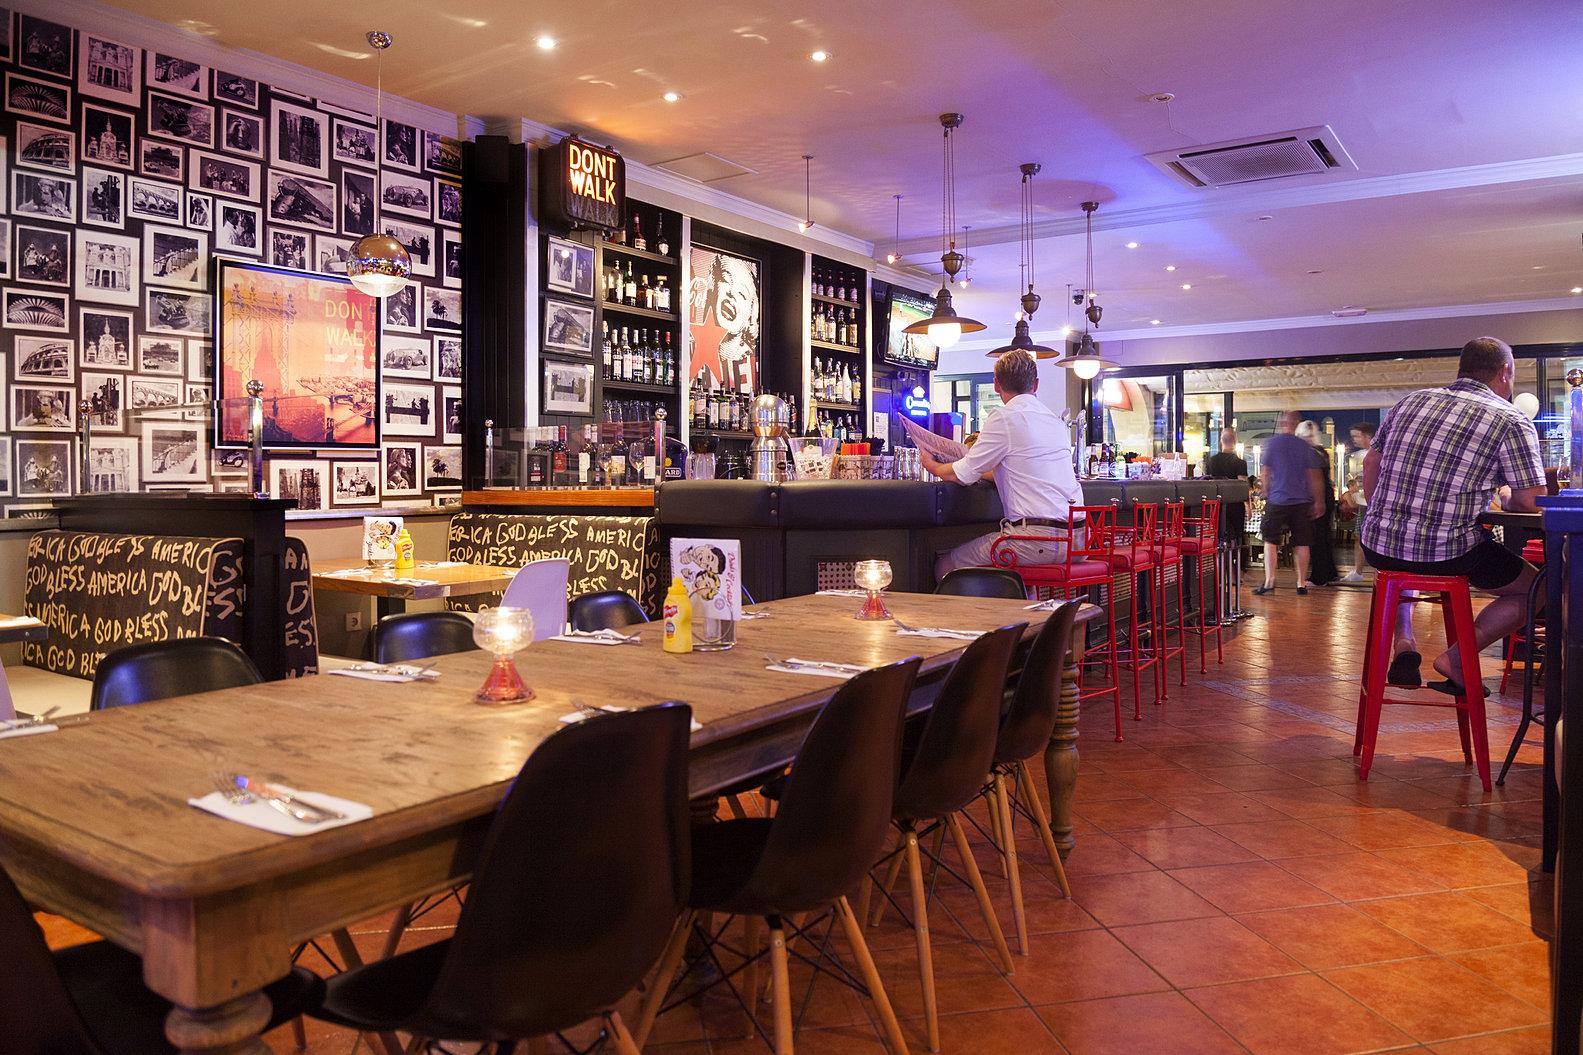 Metro grupo restaurants spain - Jacks smokehouse puerto banus ...